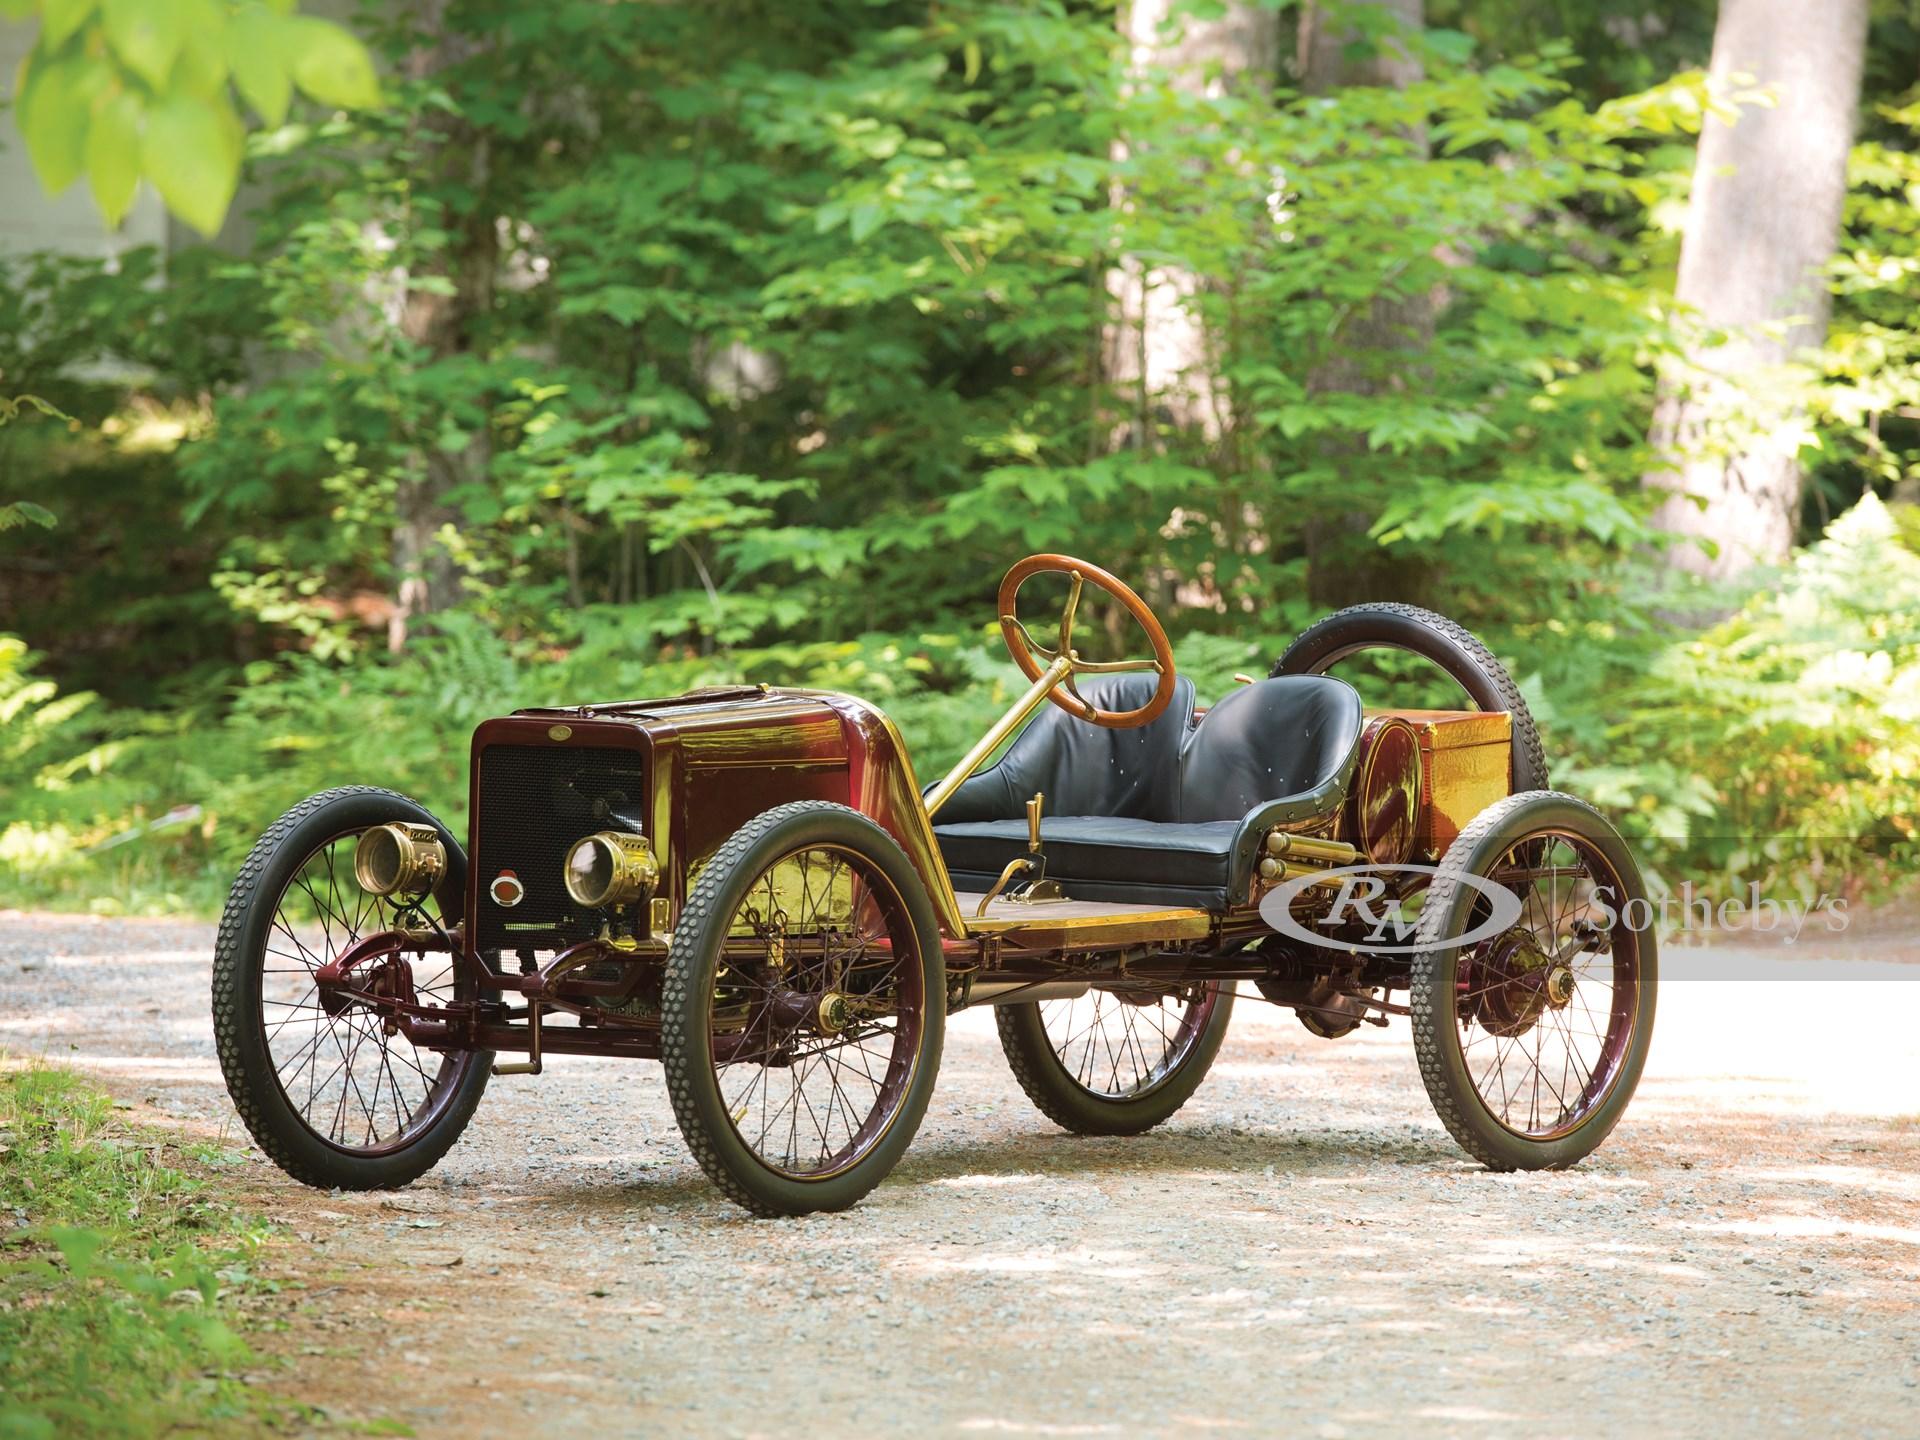 1913 Spacke Cyclecar Prototype